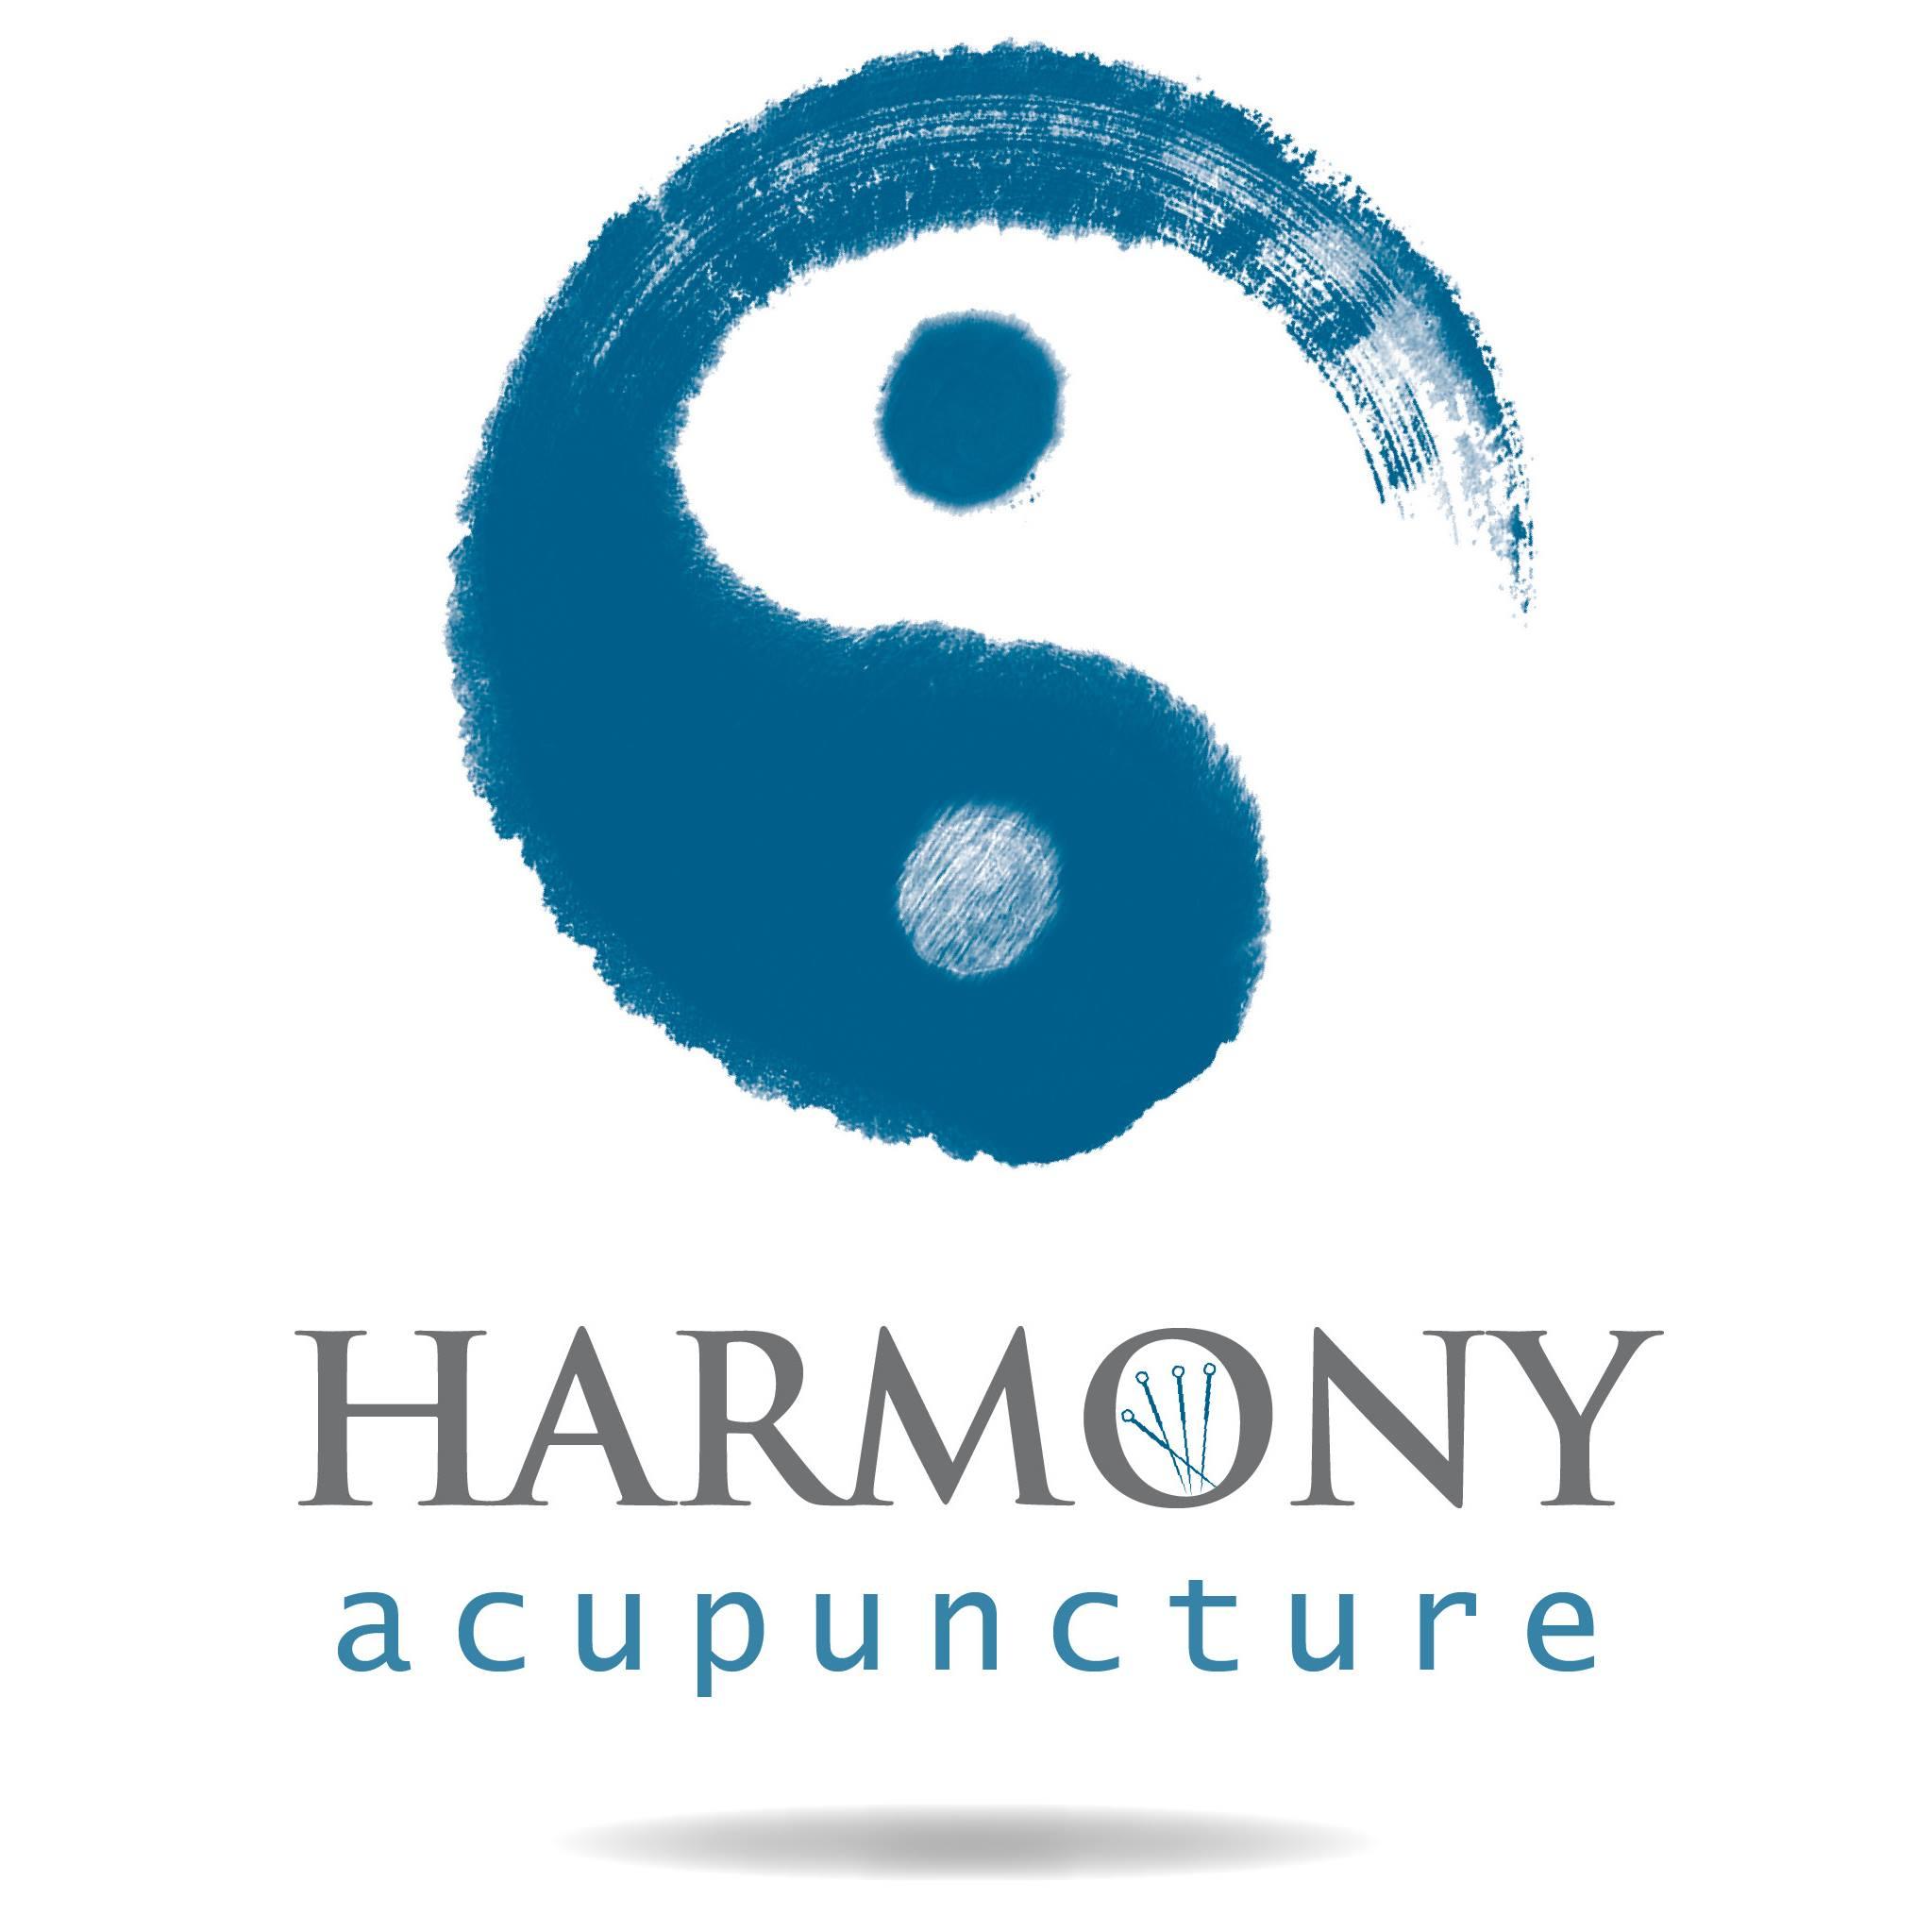 Harmony Acupuncture